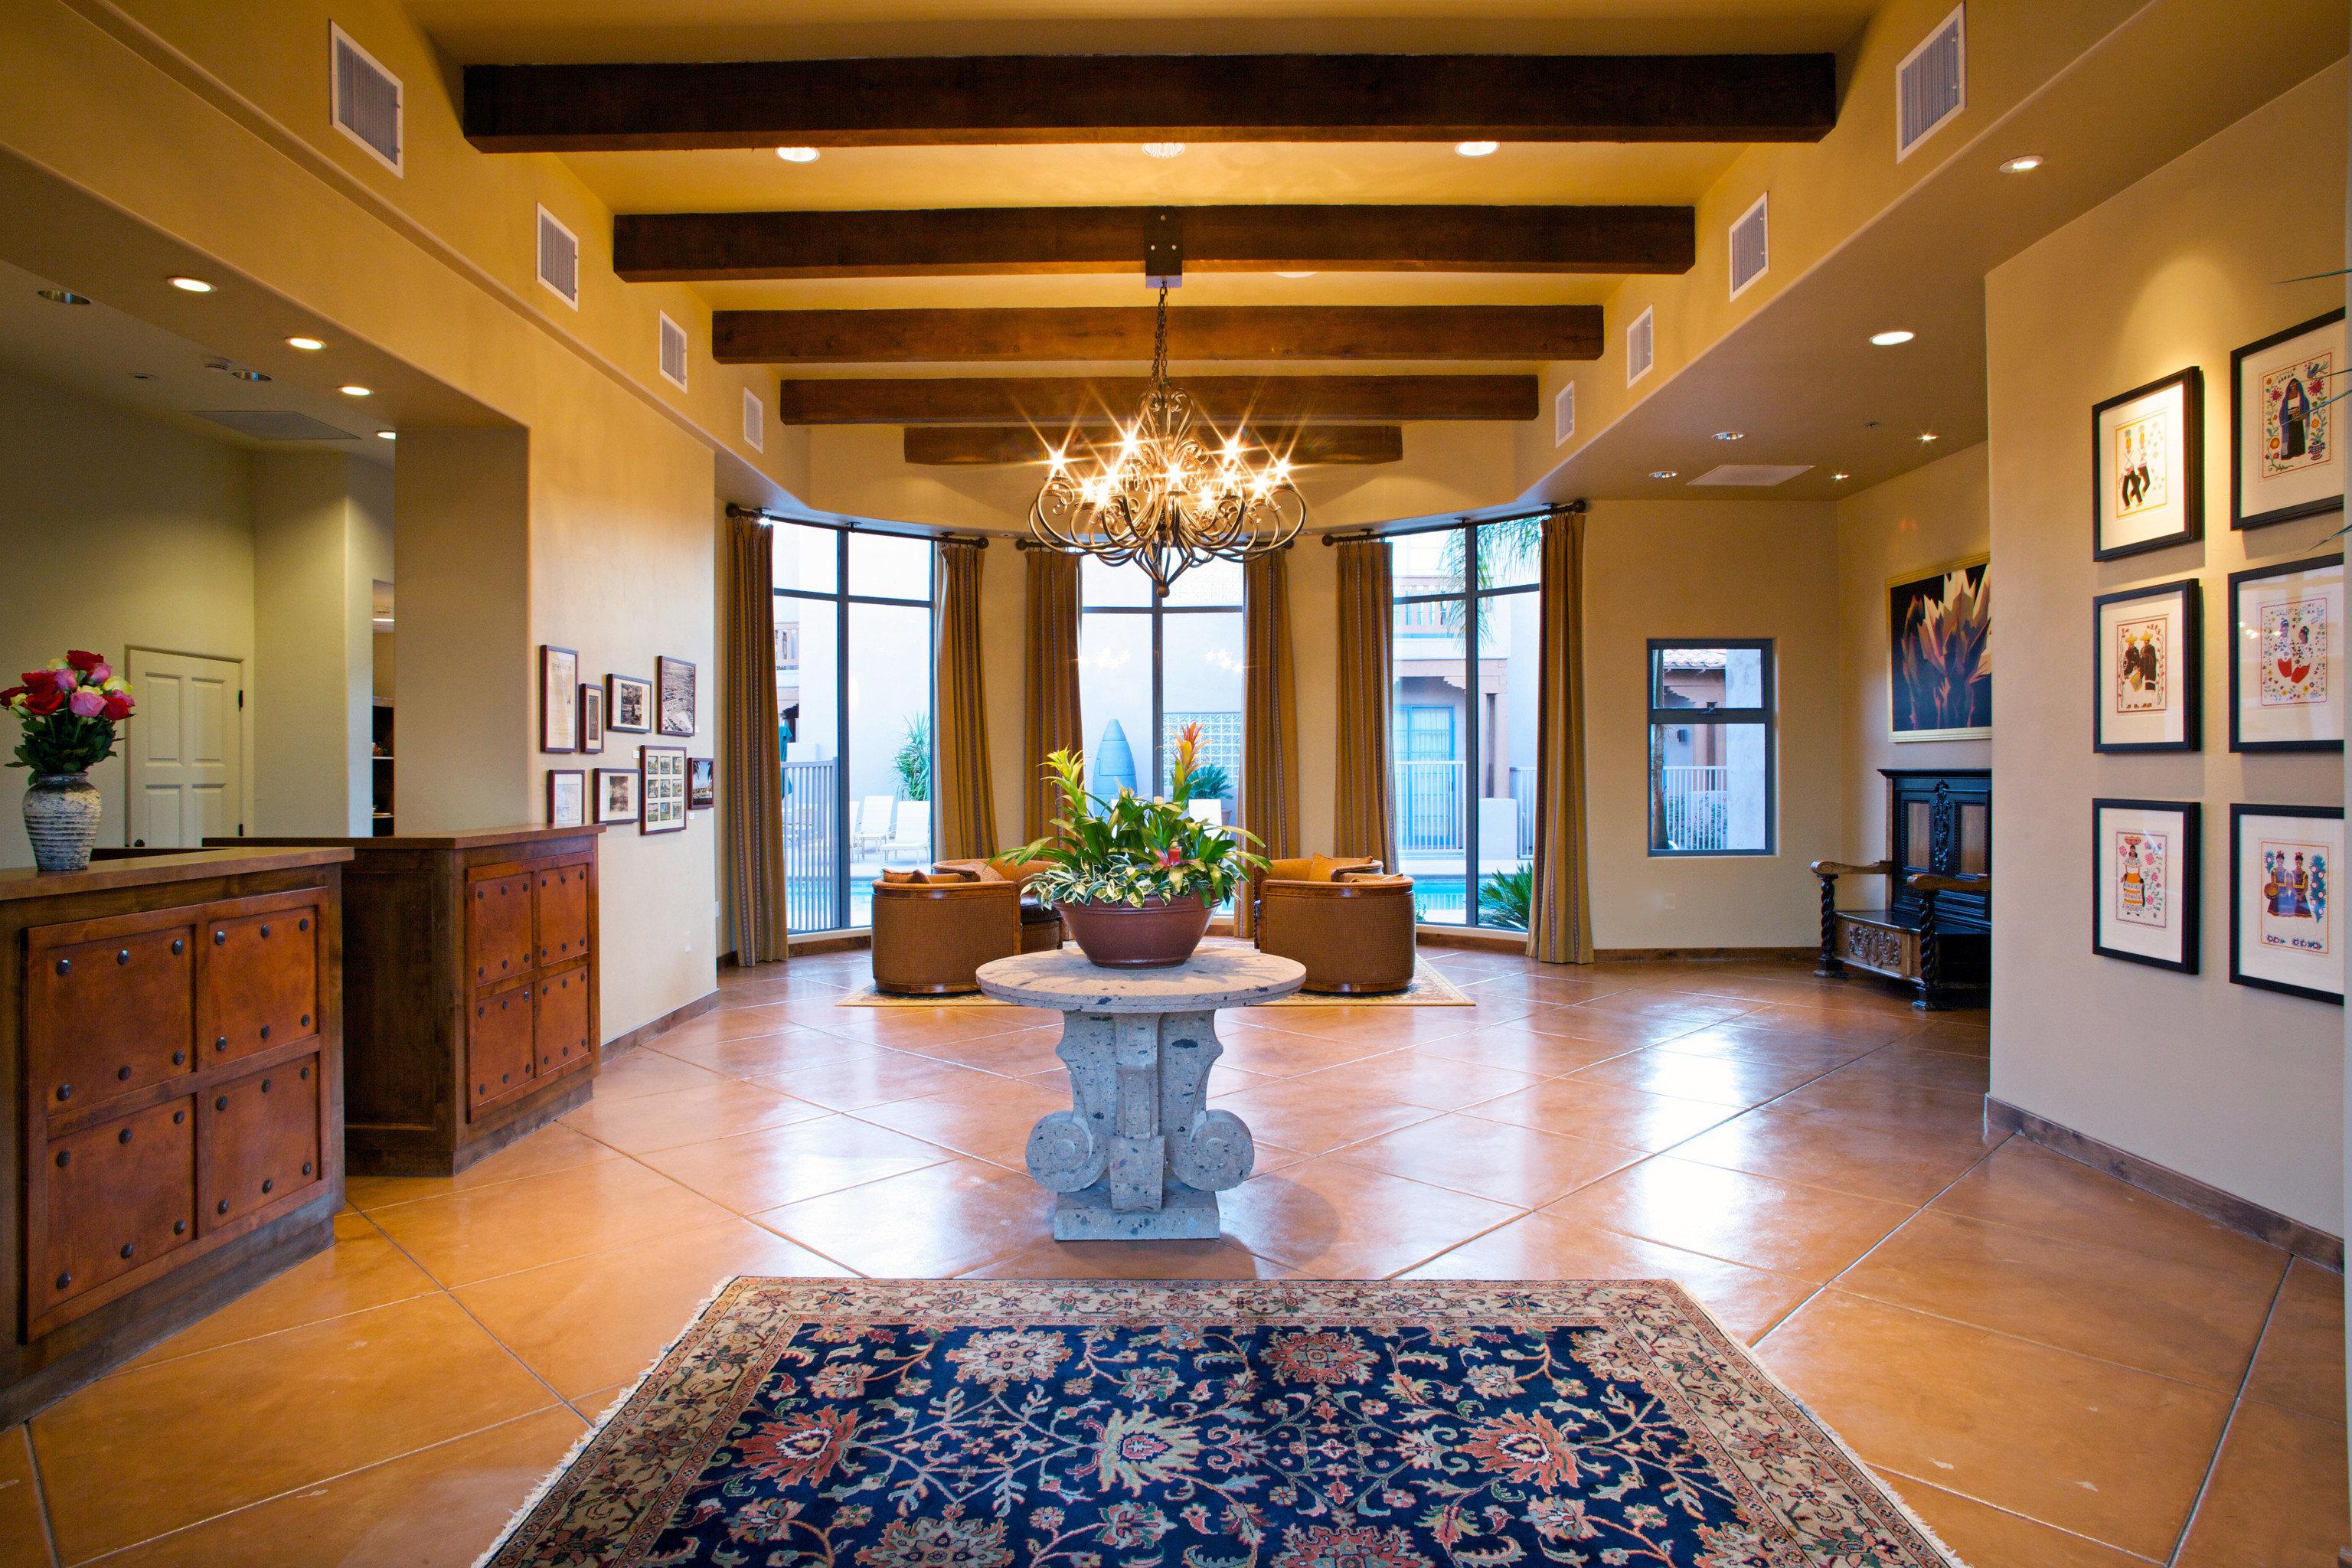 Lobby home living room hall art gallery tourist attraction mansion ballroom flooring